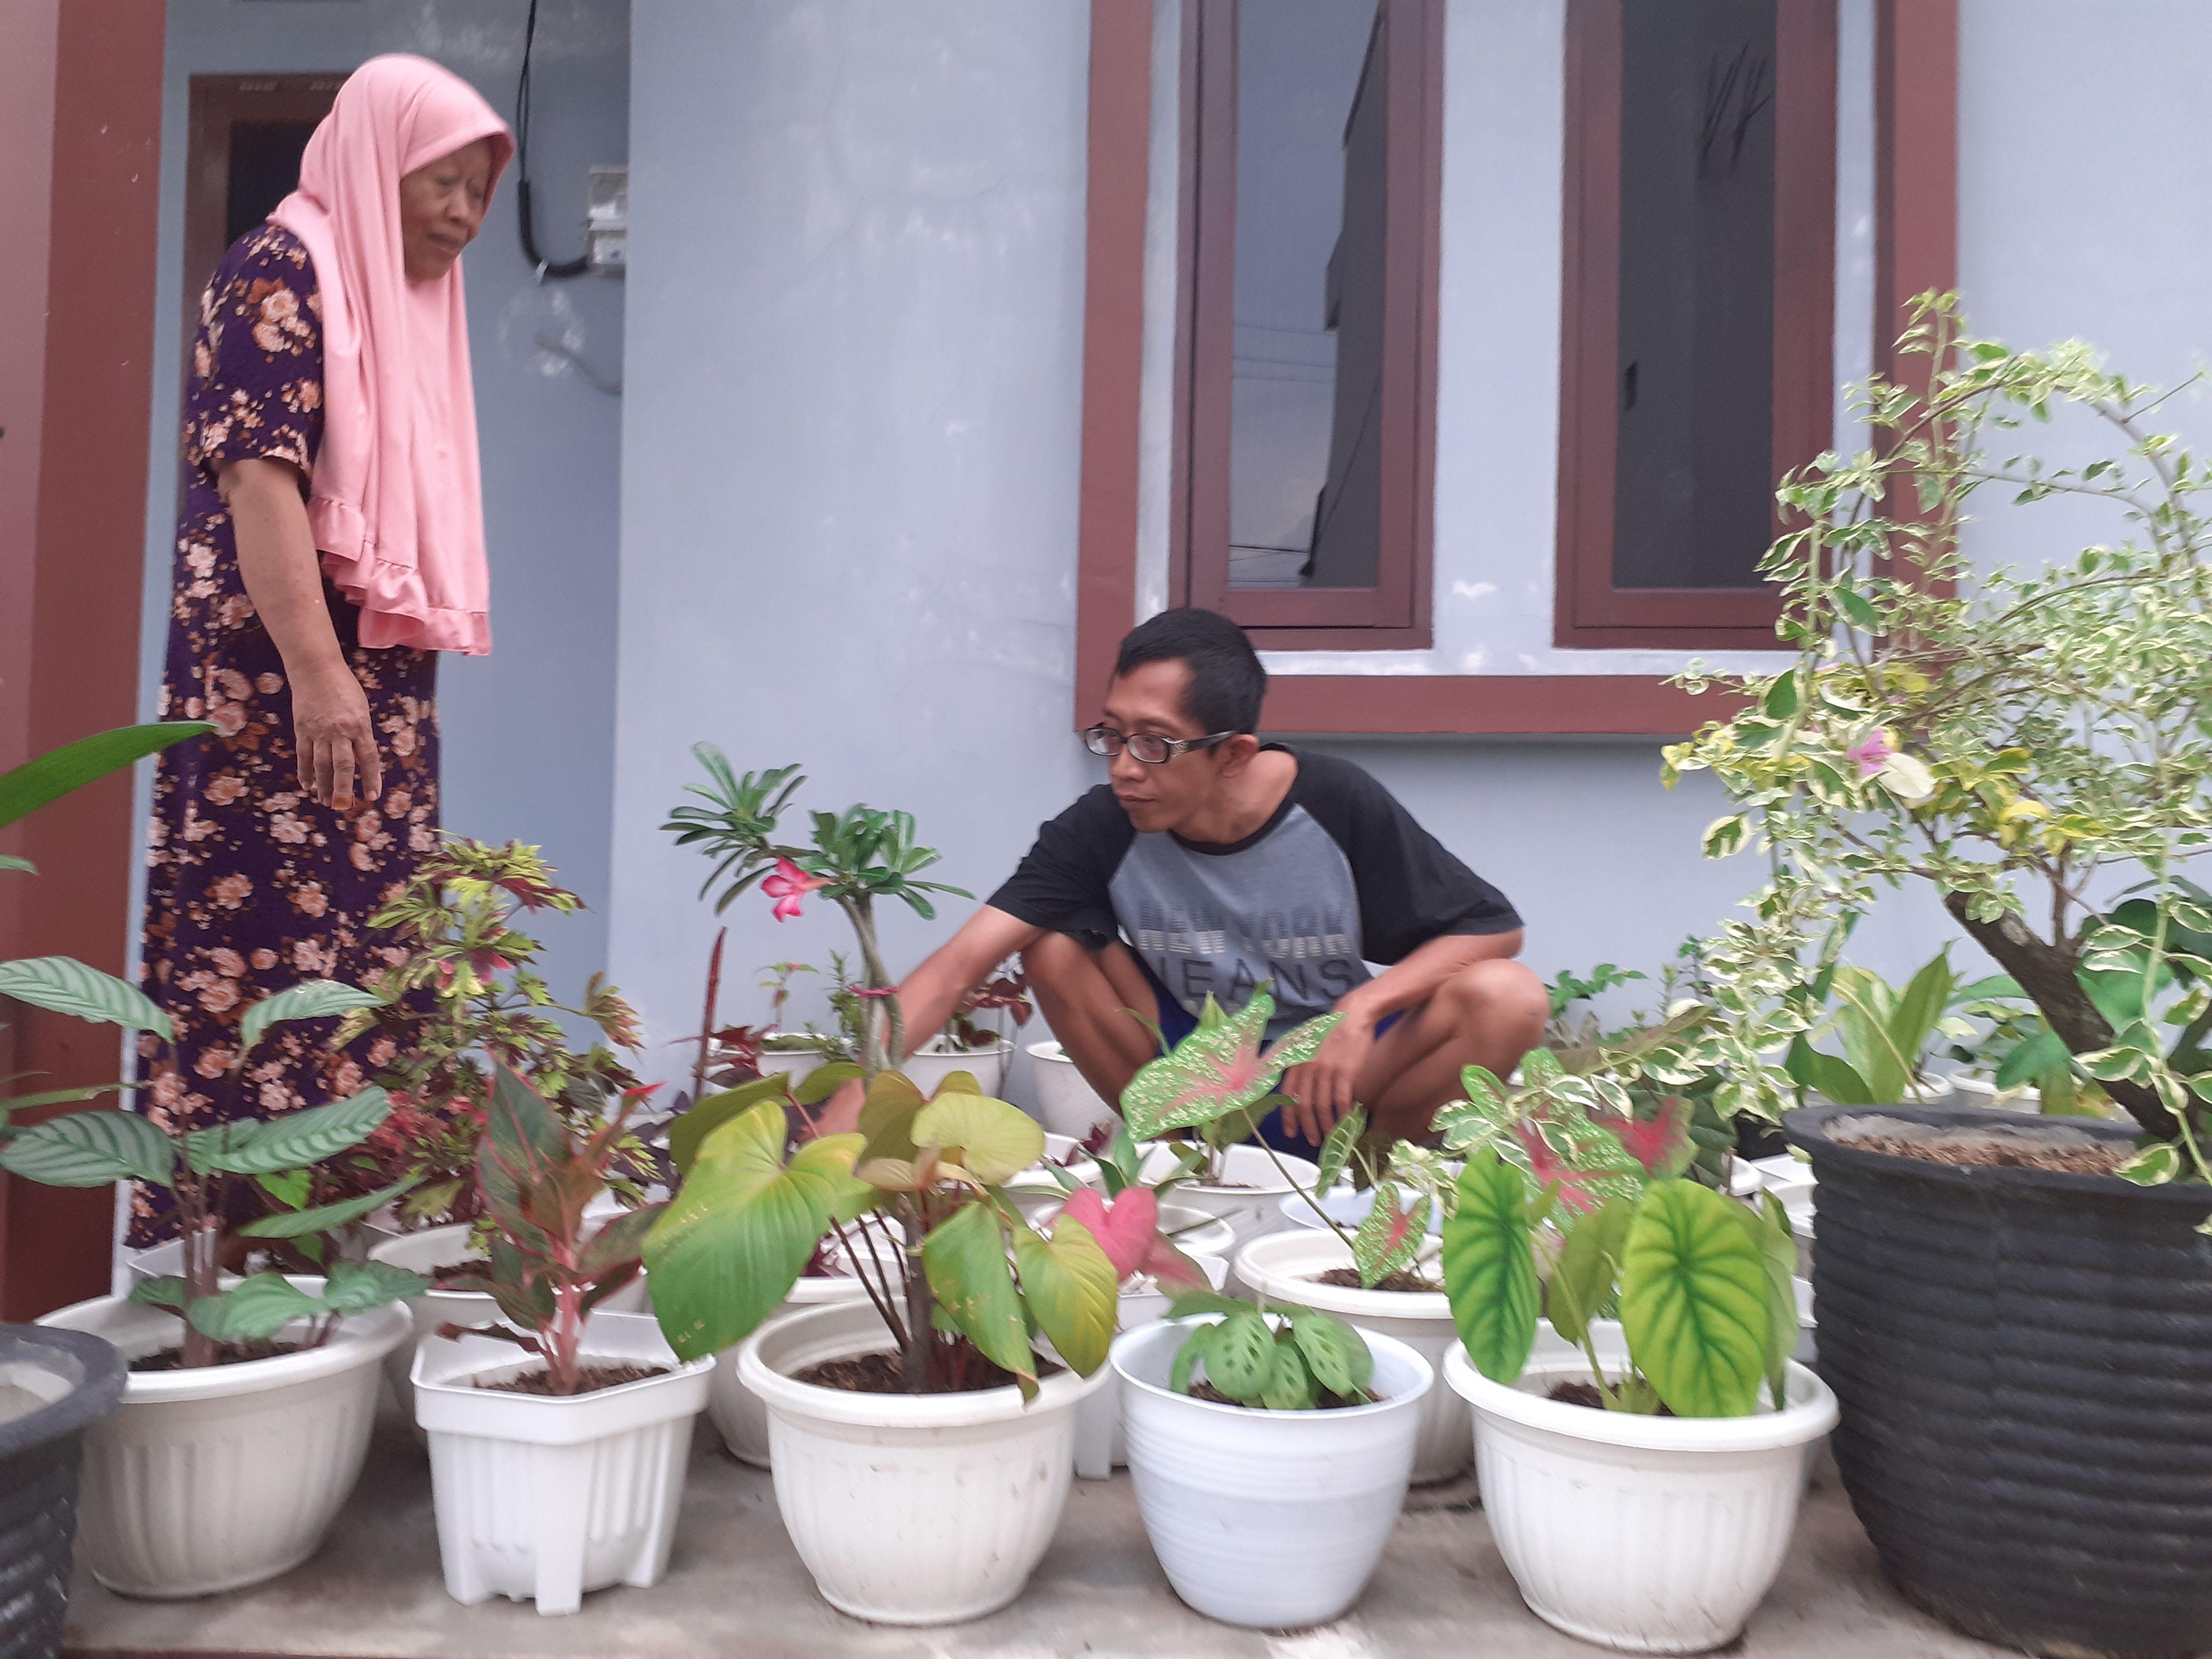 Mamaku Wanita Tangguhku dan Inspirasiku | Saat saya berkolaborasi dengan Mama bercocok tanam bunga | Dokumen Pribadi ( Hasil Jepretan Istri dengan Menggunakan Hp Saya)